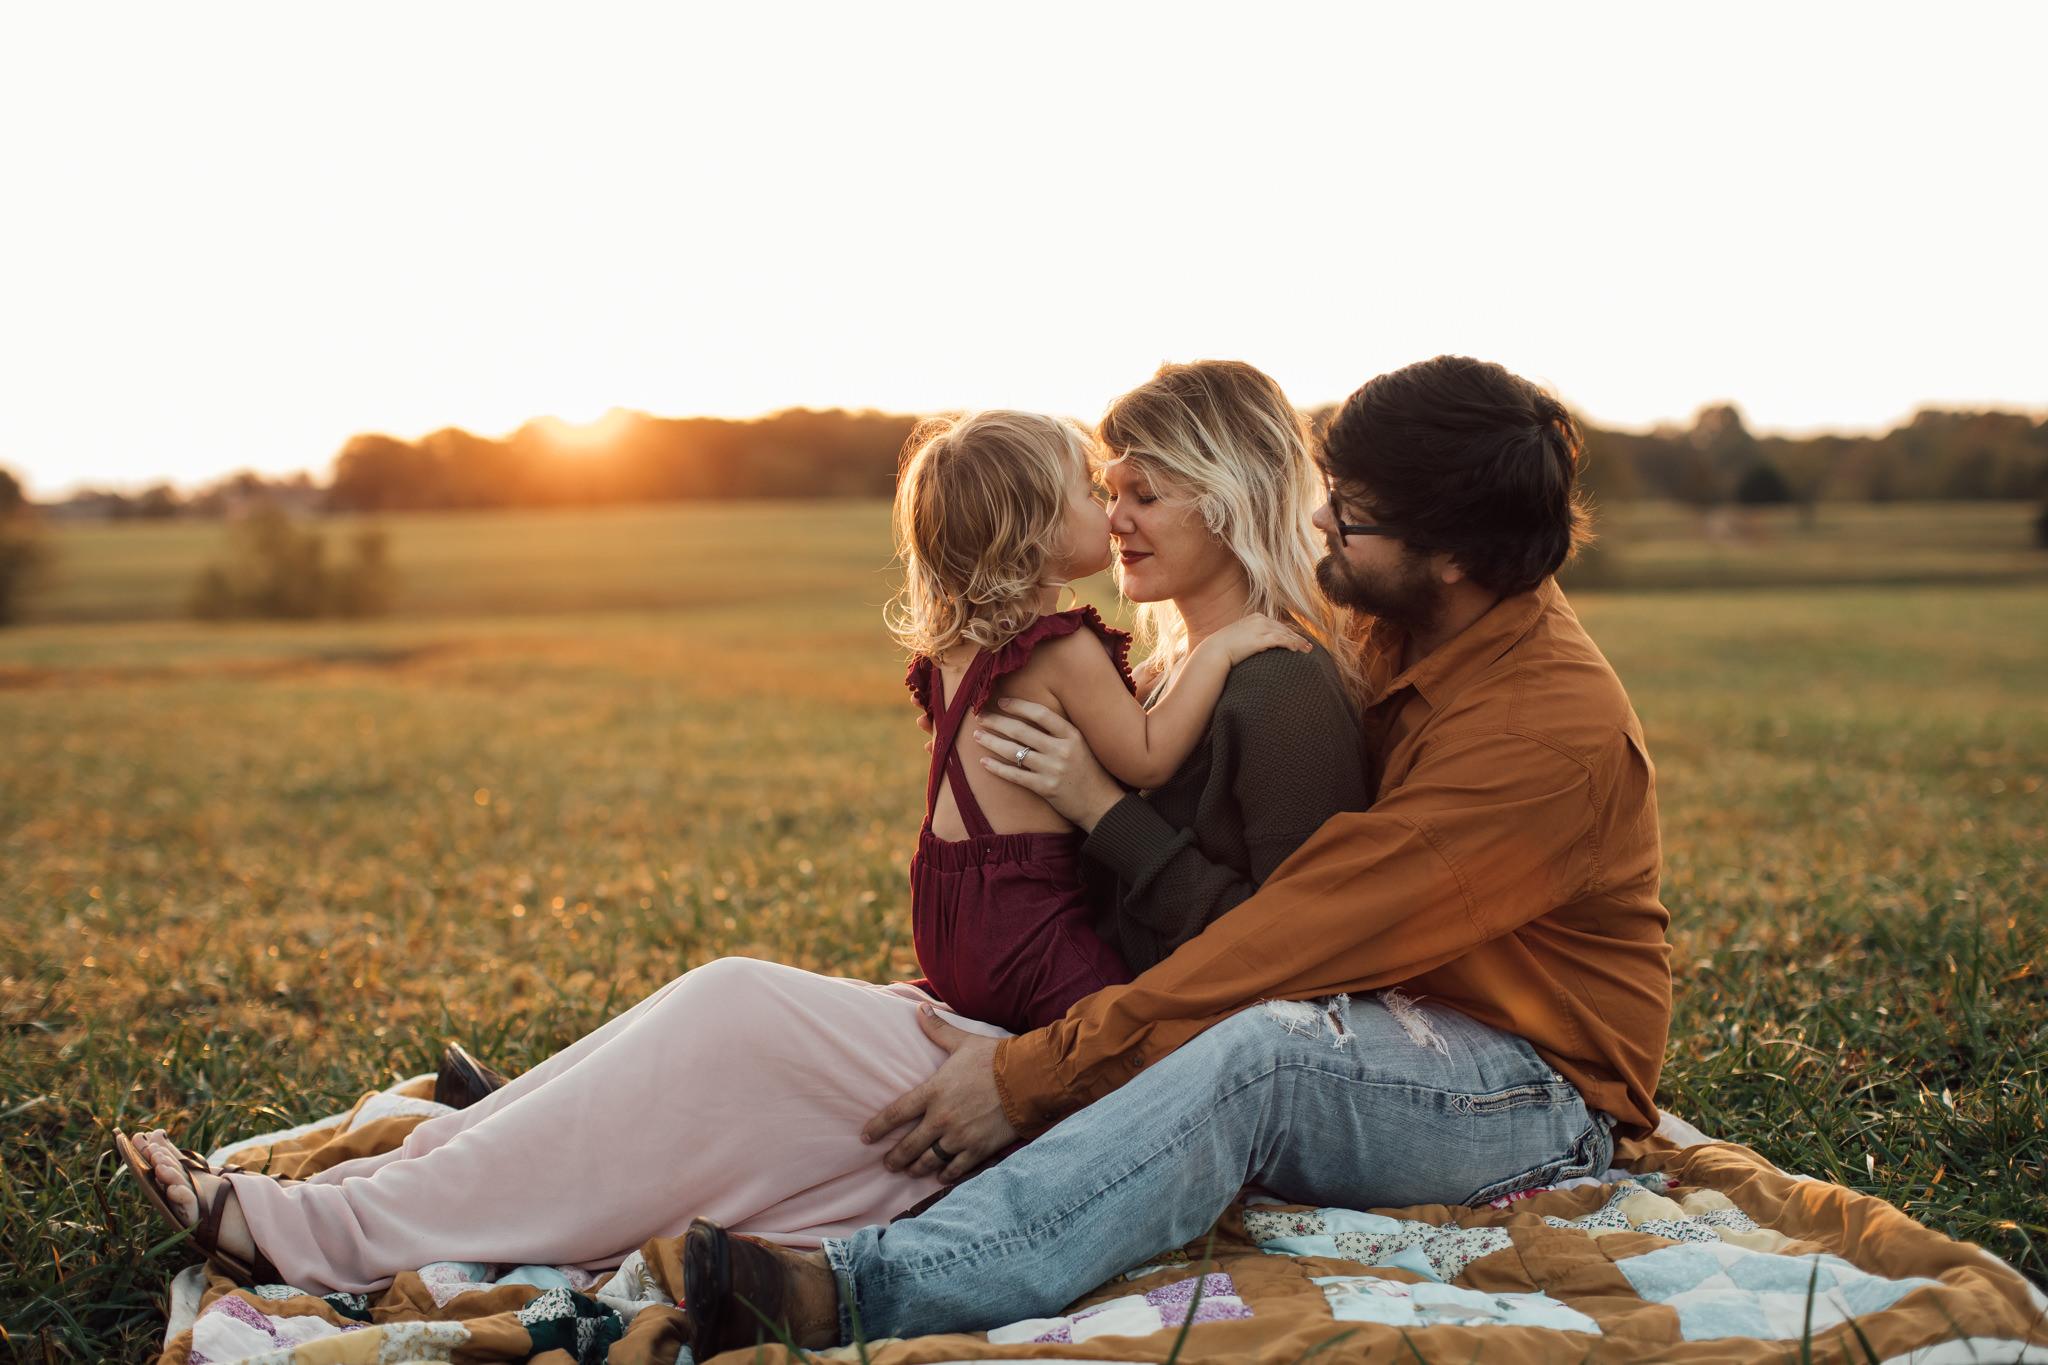 cassie-cook-photography-memphis-family-photographer-lifestyle-family-photographer-sunrise-gray-family-14.jpg